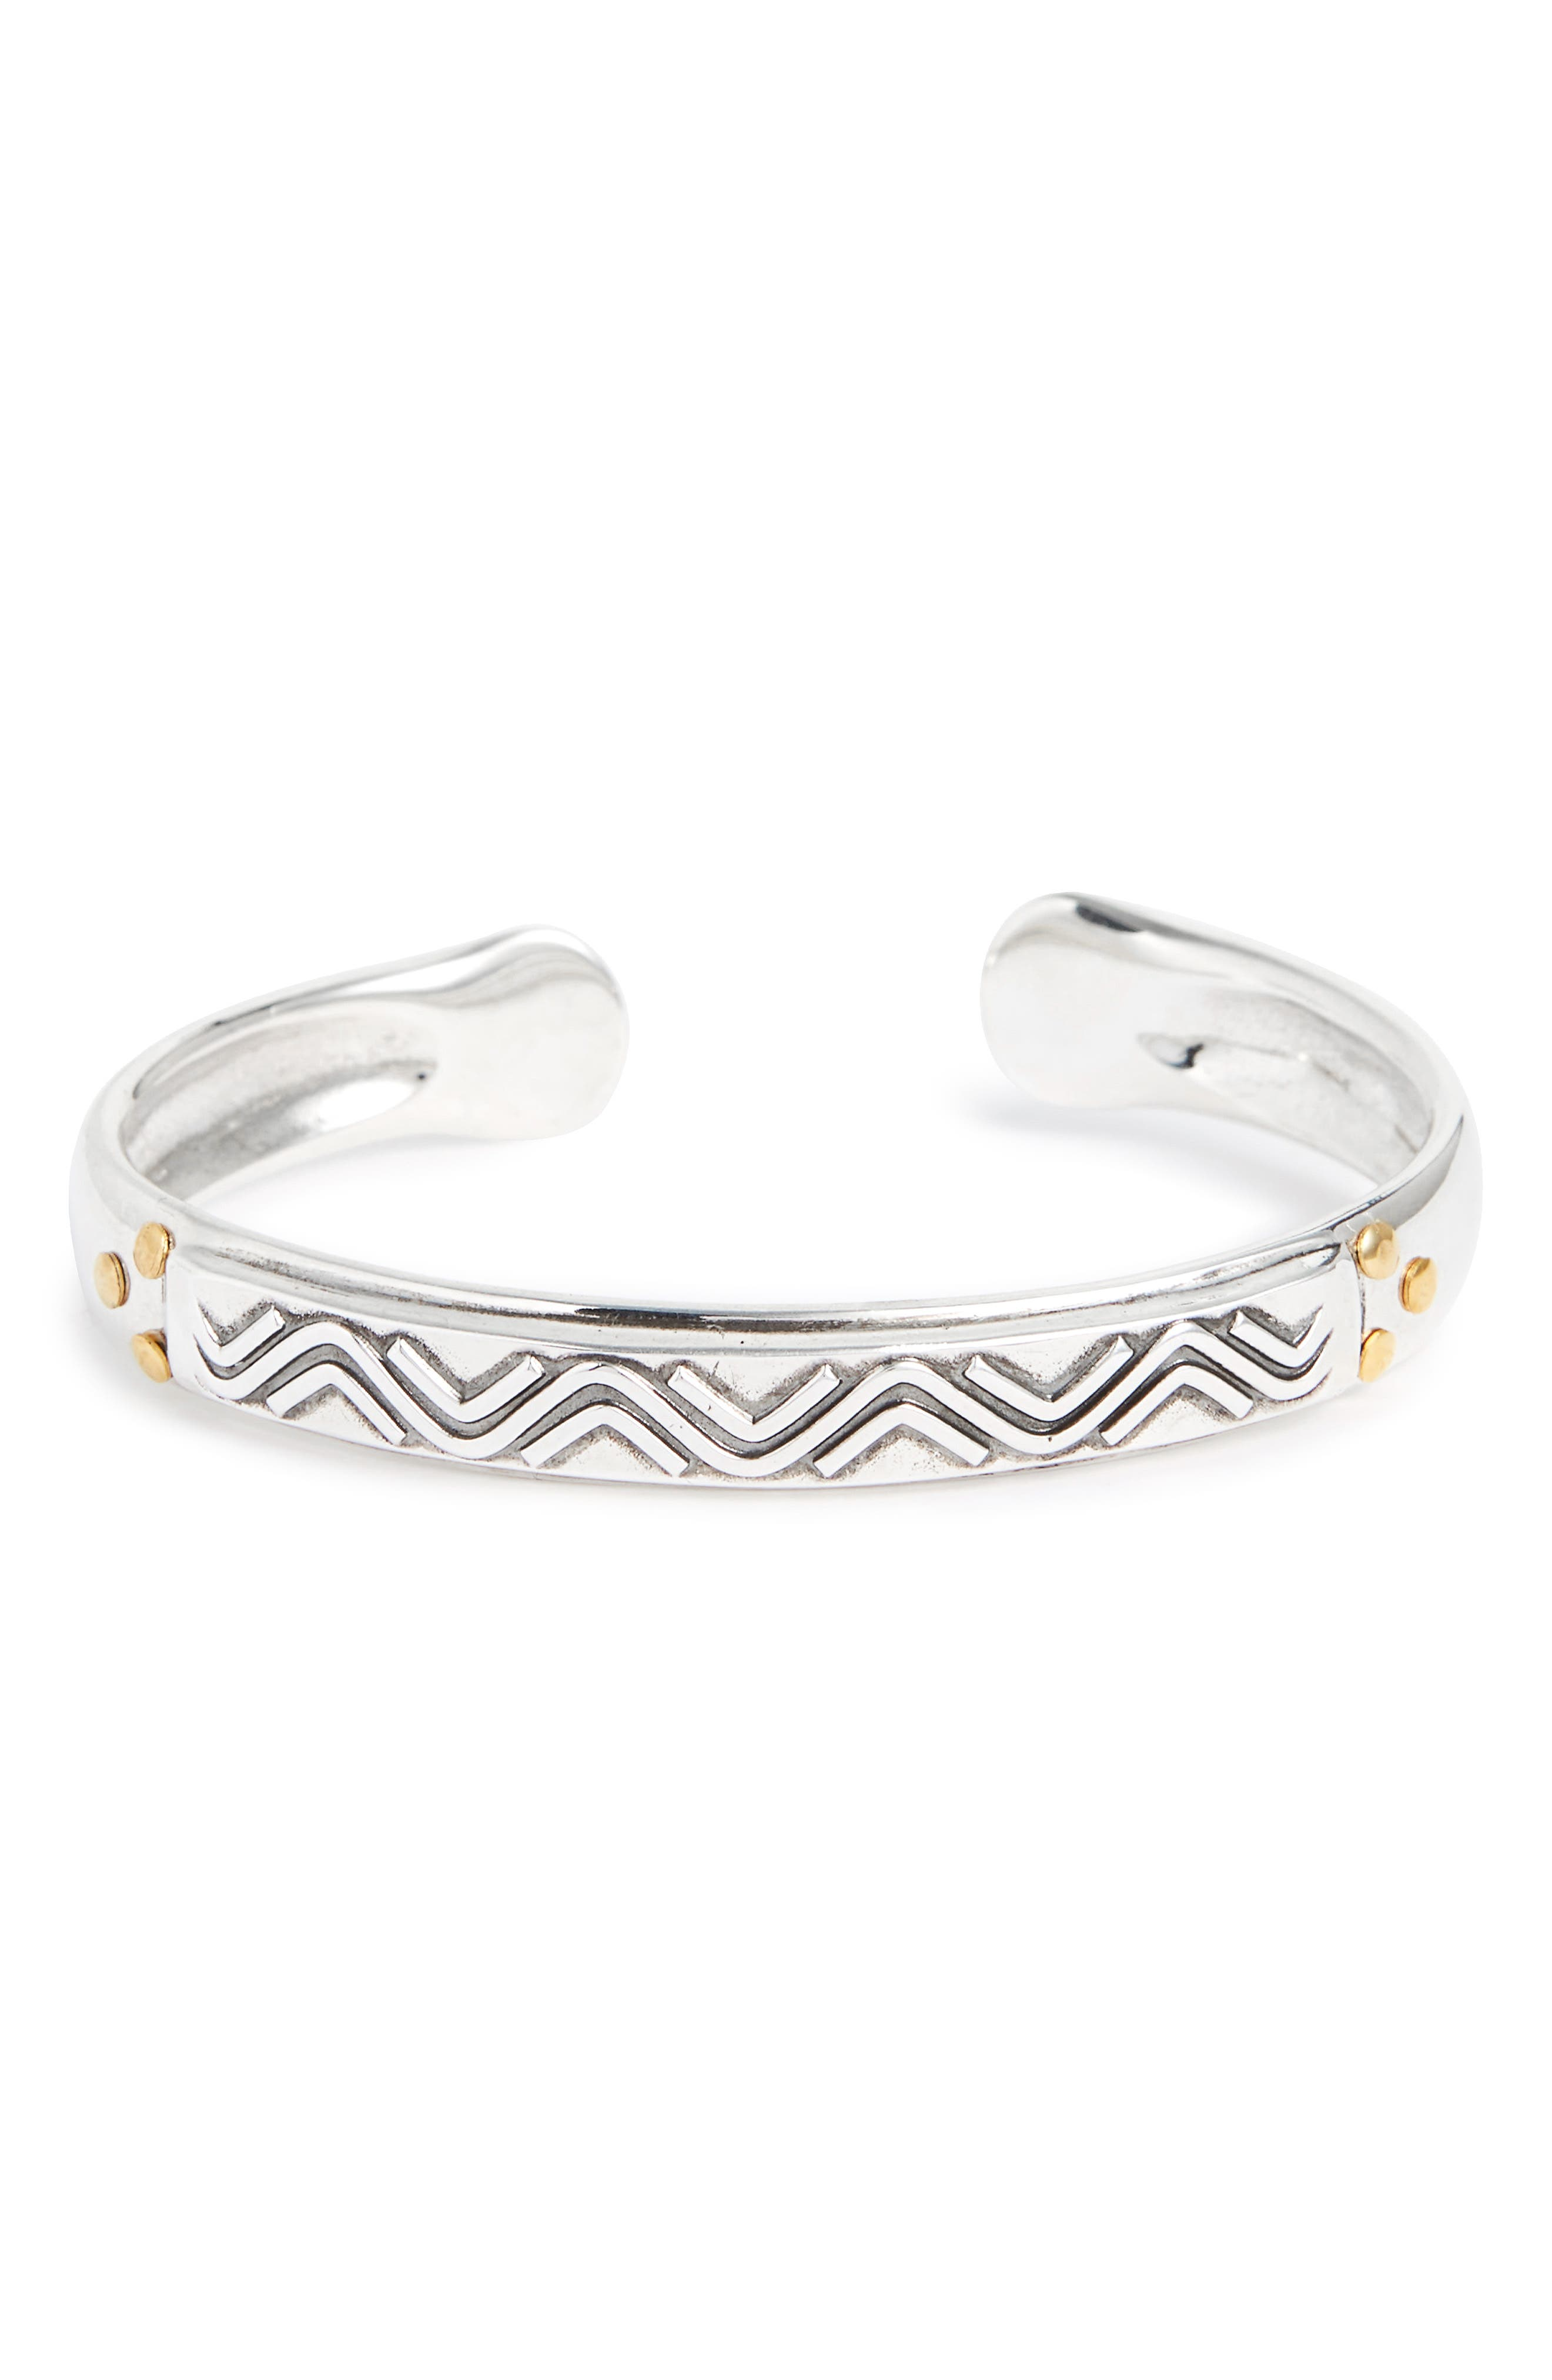 Matis Cuff Bracelet,                             Main thumbnail 1, color,                             040